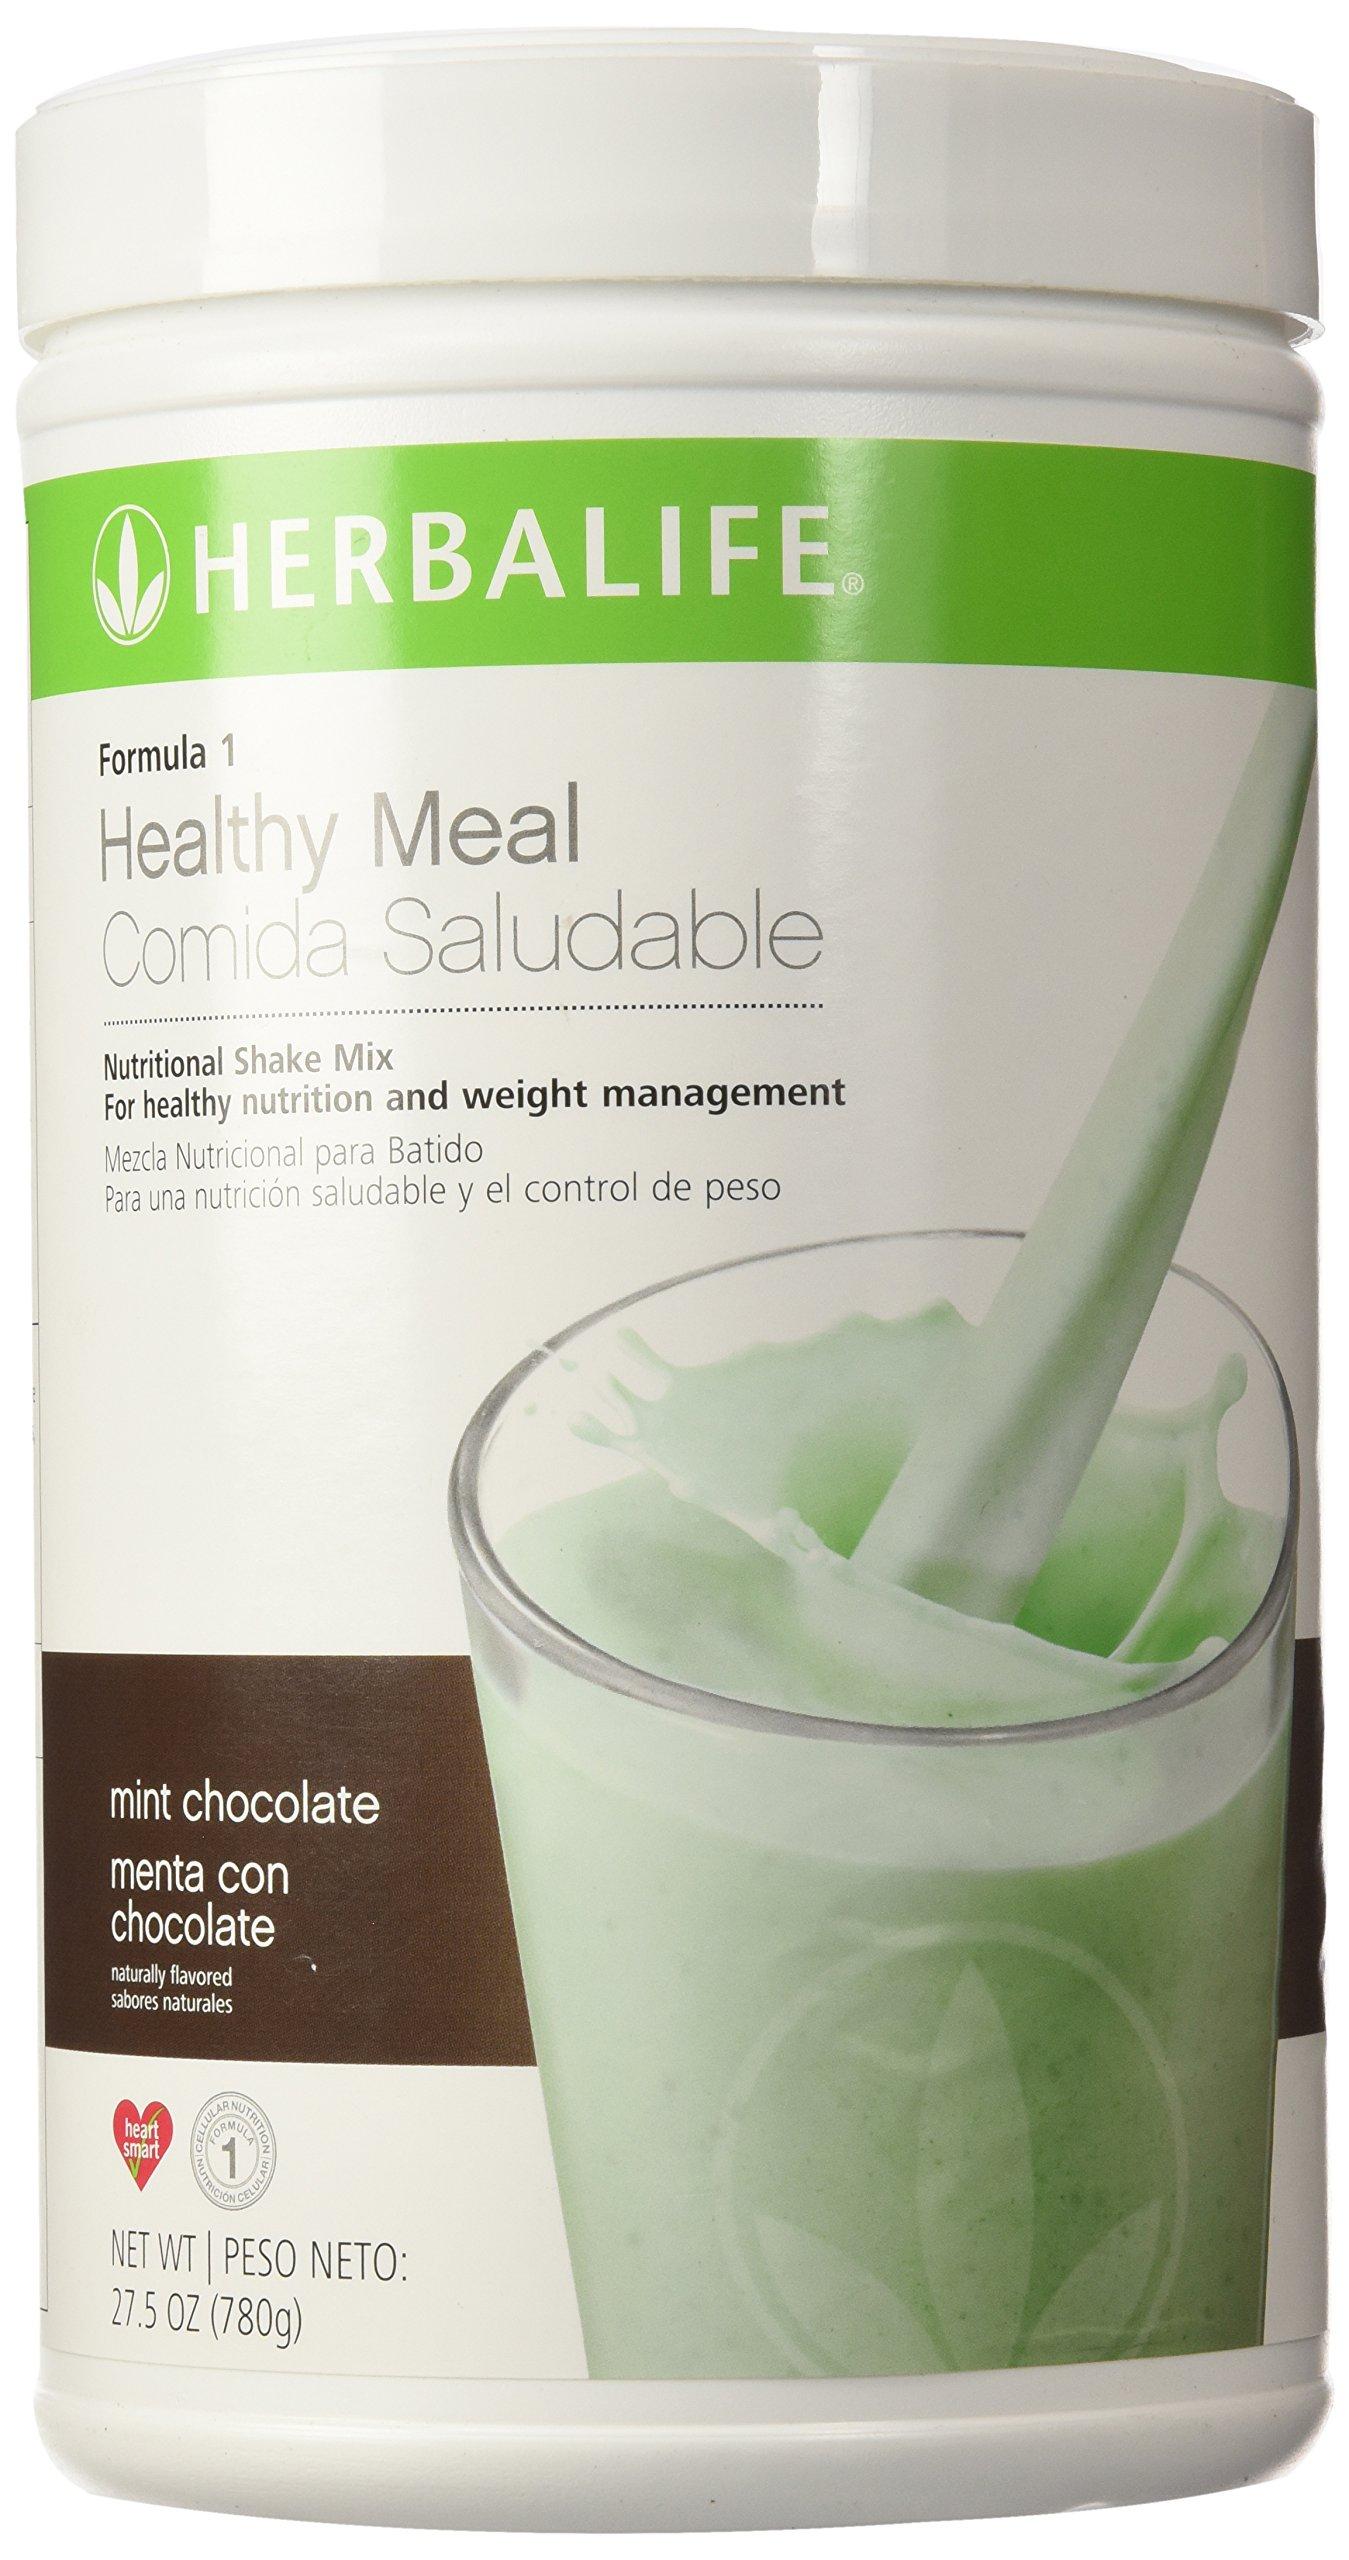 Herbalife Formula 1 Nutritional Shake Mix Mint Chocolate Variasi 172 Lb Health Personal Care